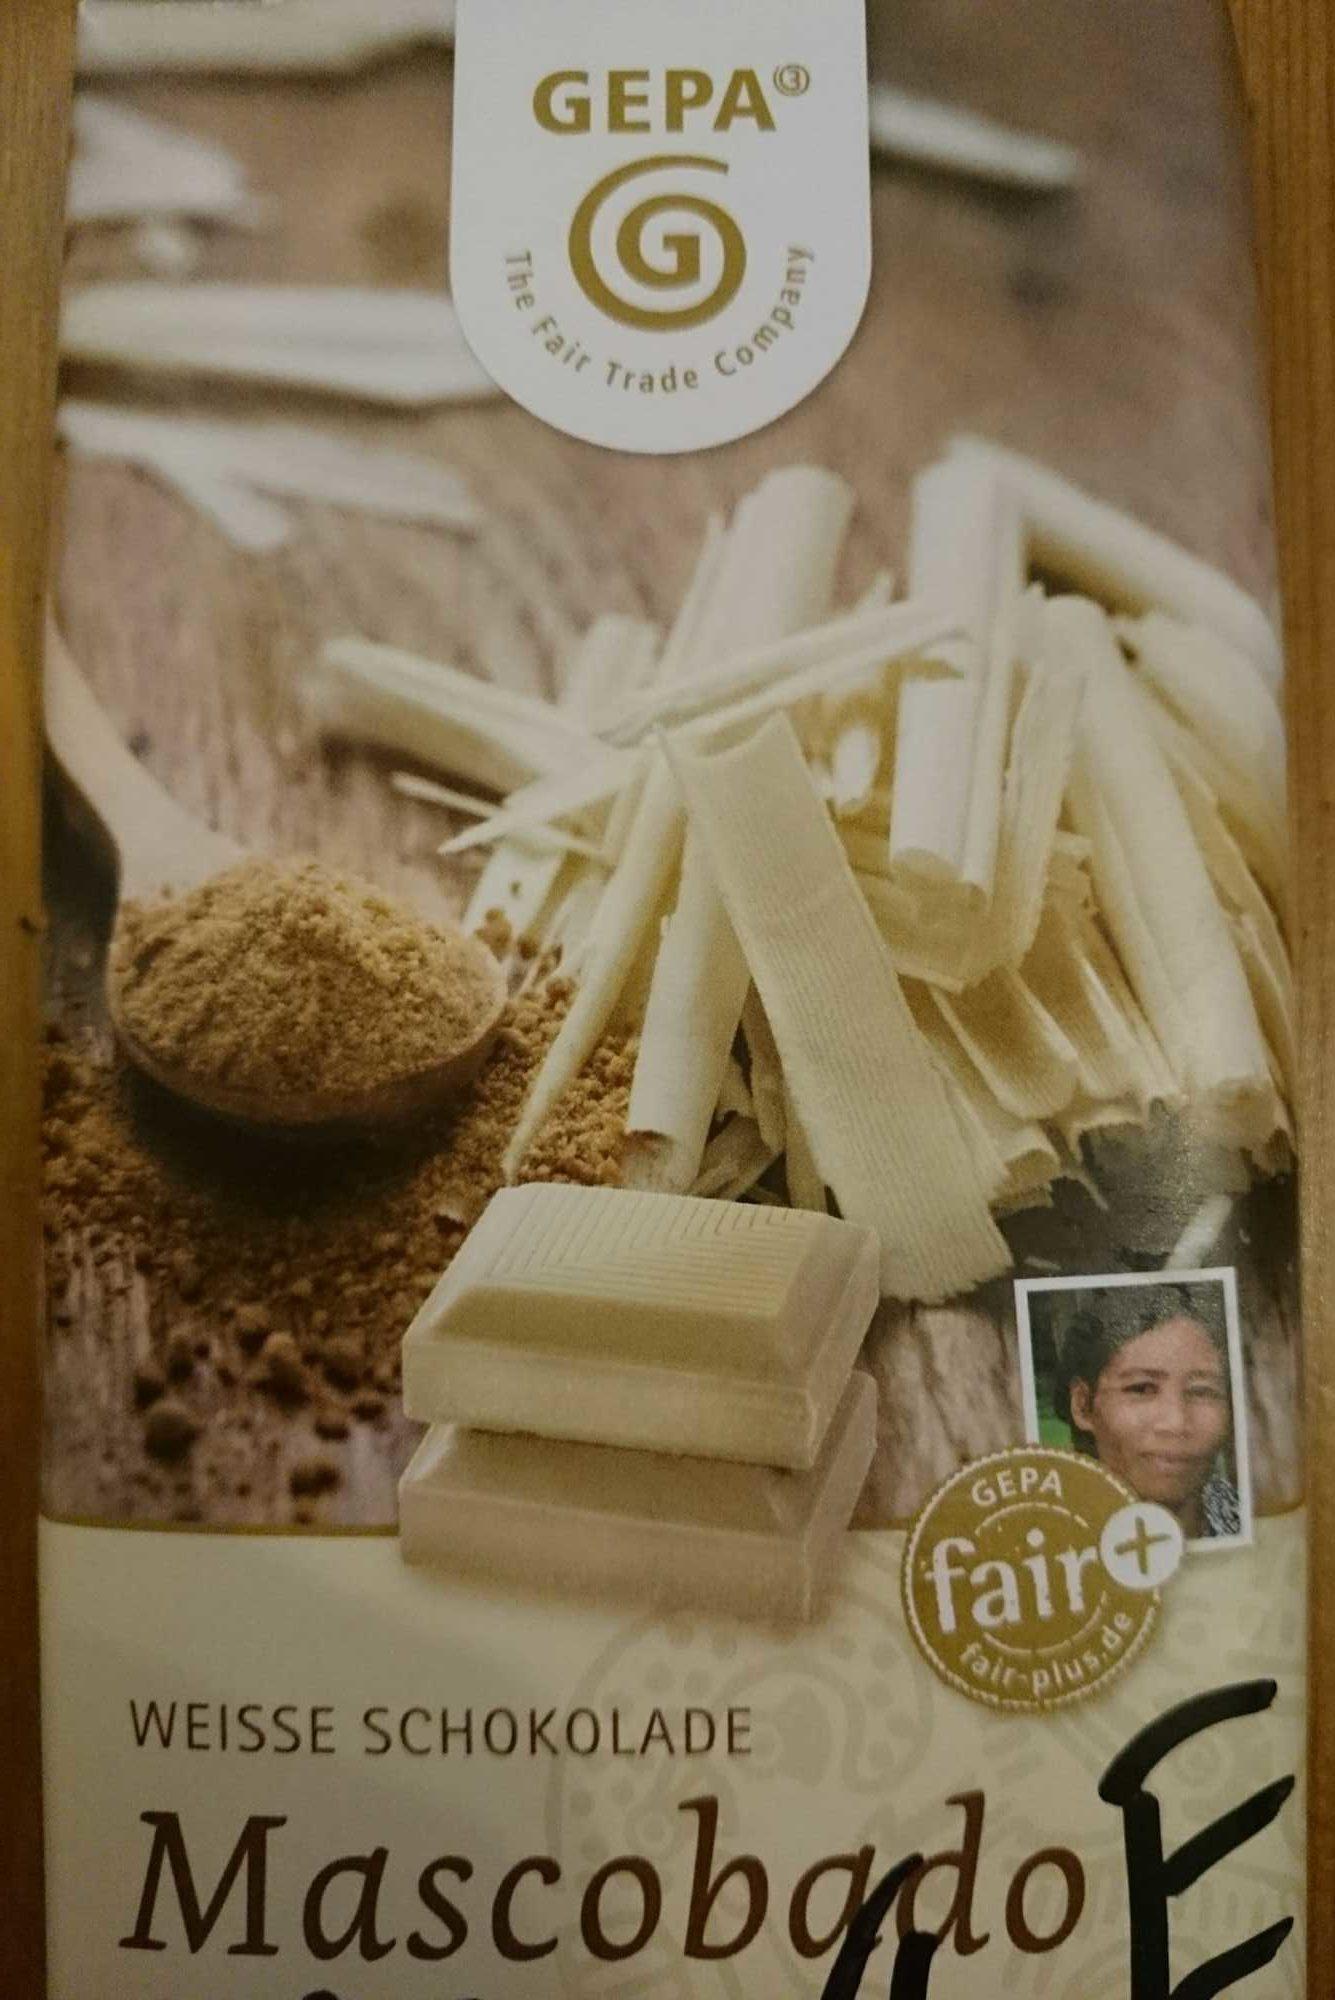 Mascobardo Weiße Schokolade - Product